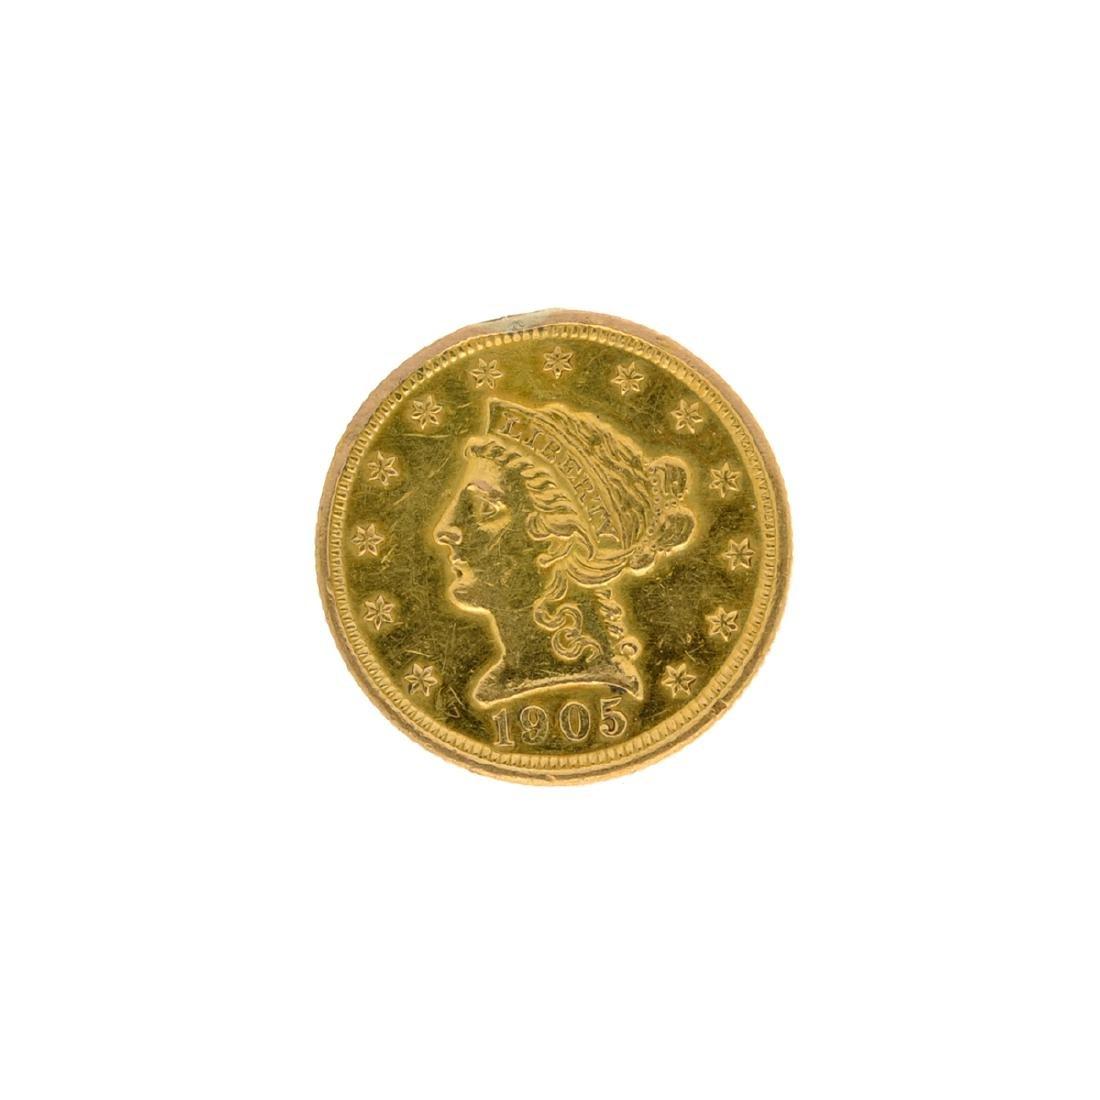 1905 $2.50 U.S. Liberty Head Gold Coin